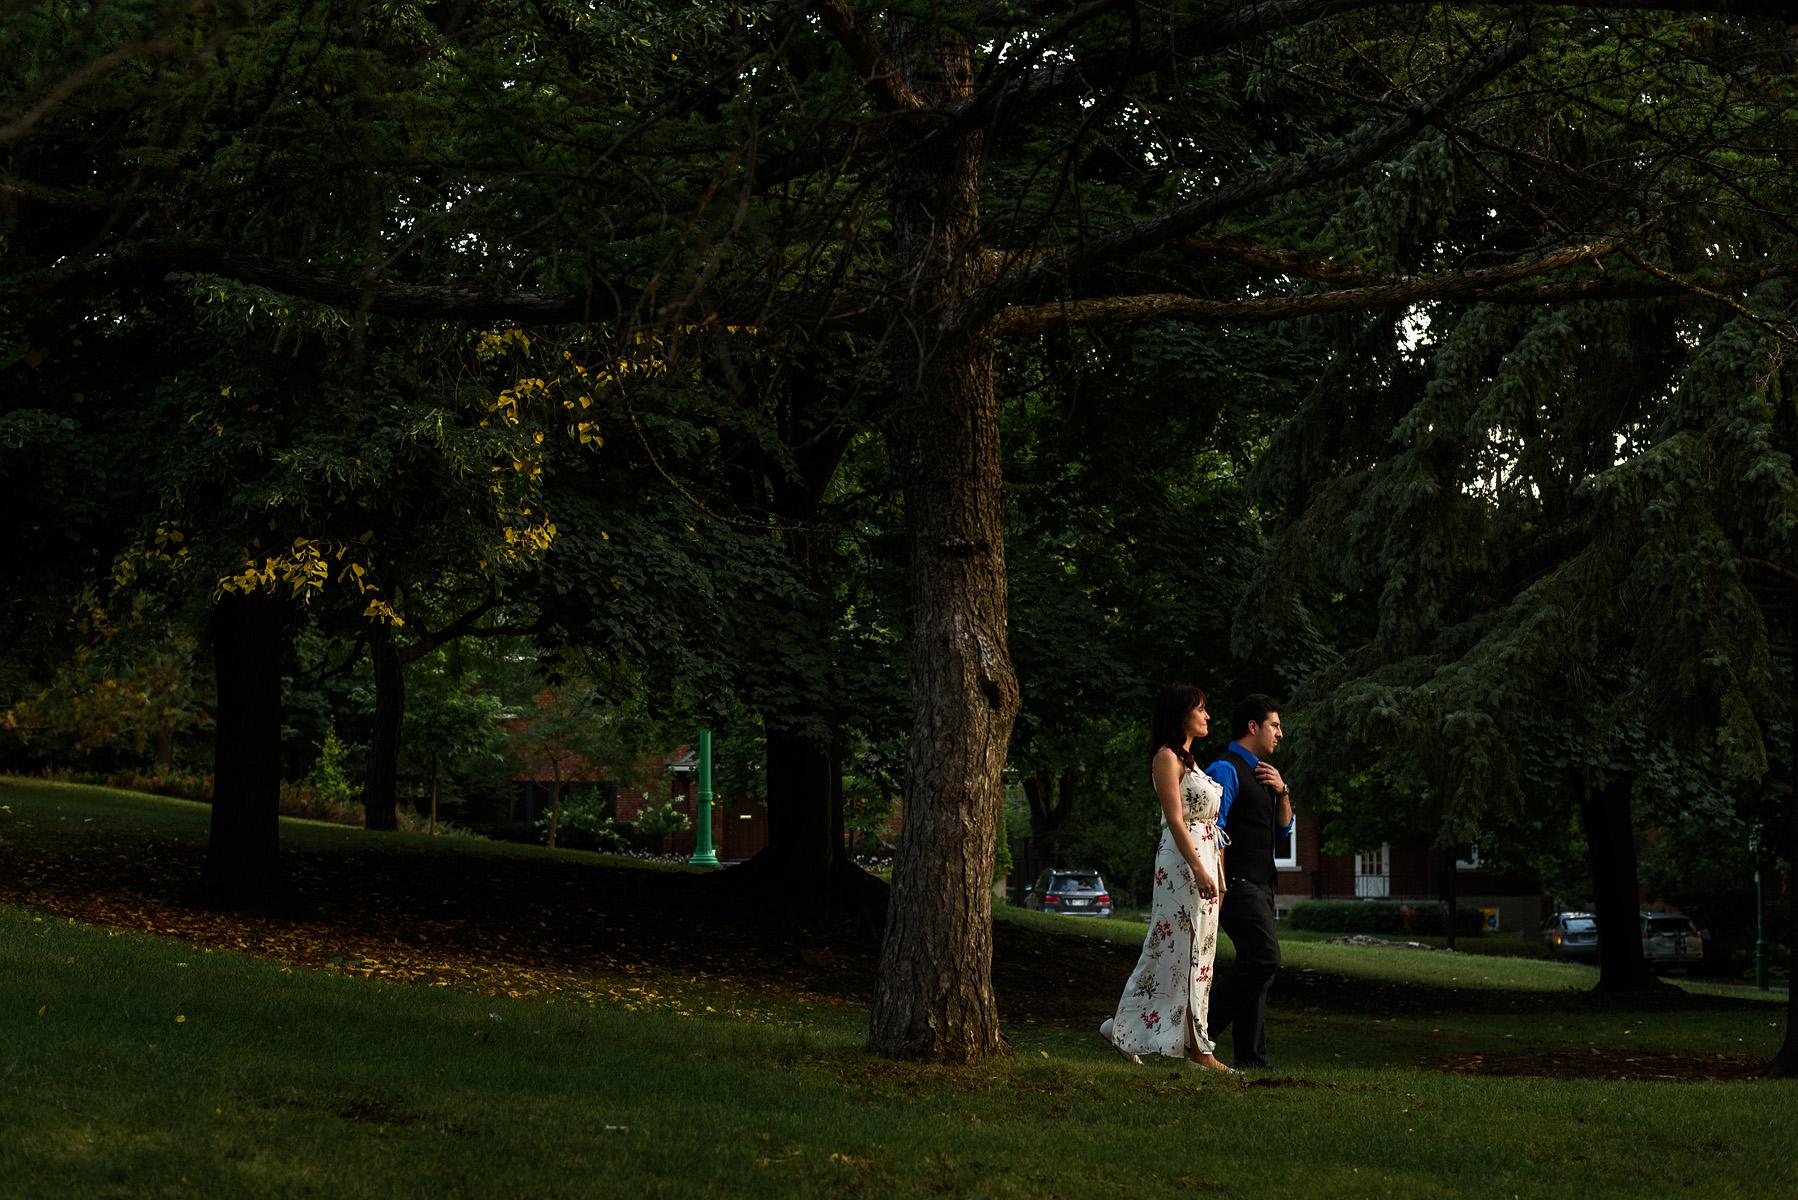 francisco-genevieve-couple-33.jpg